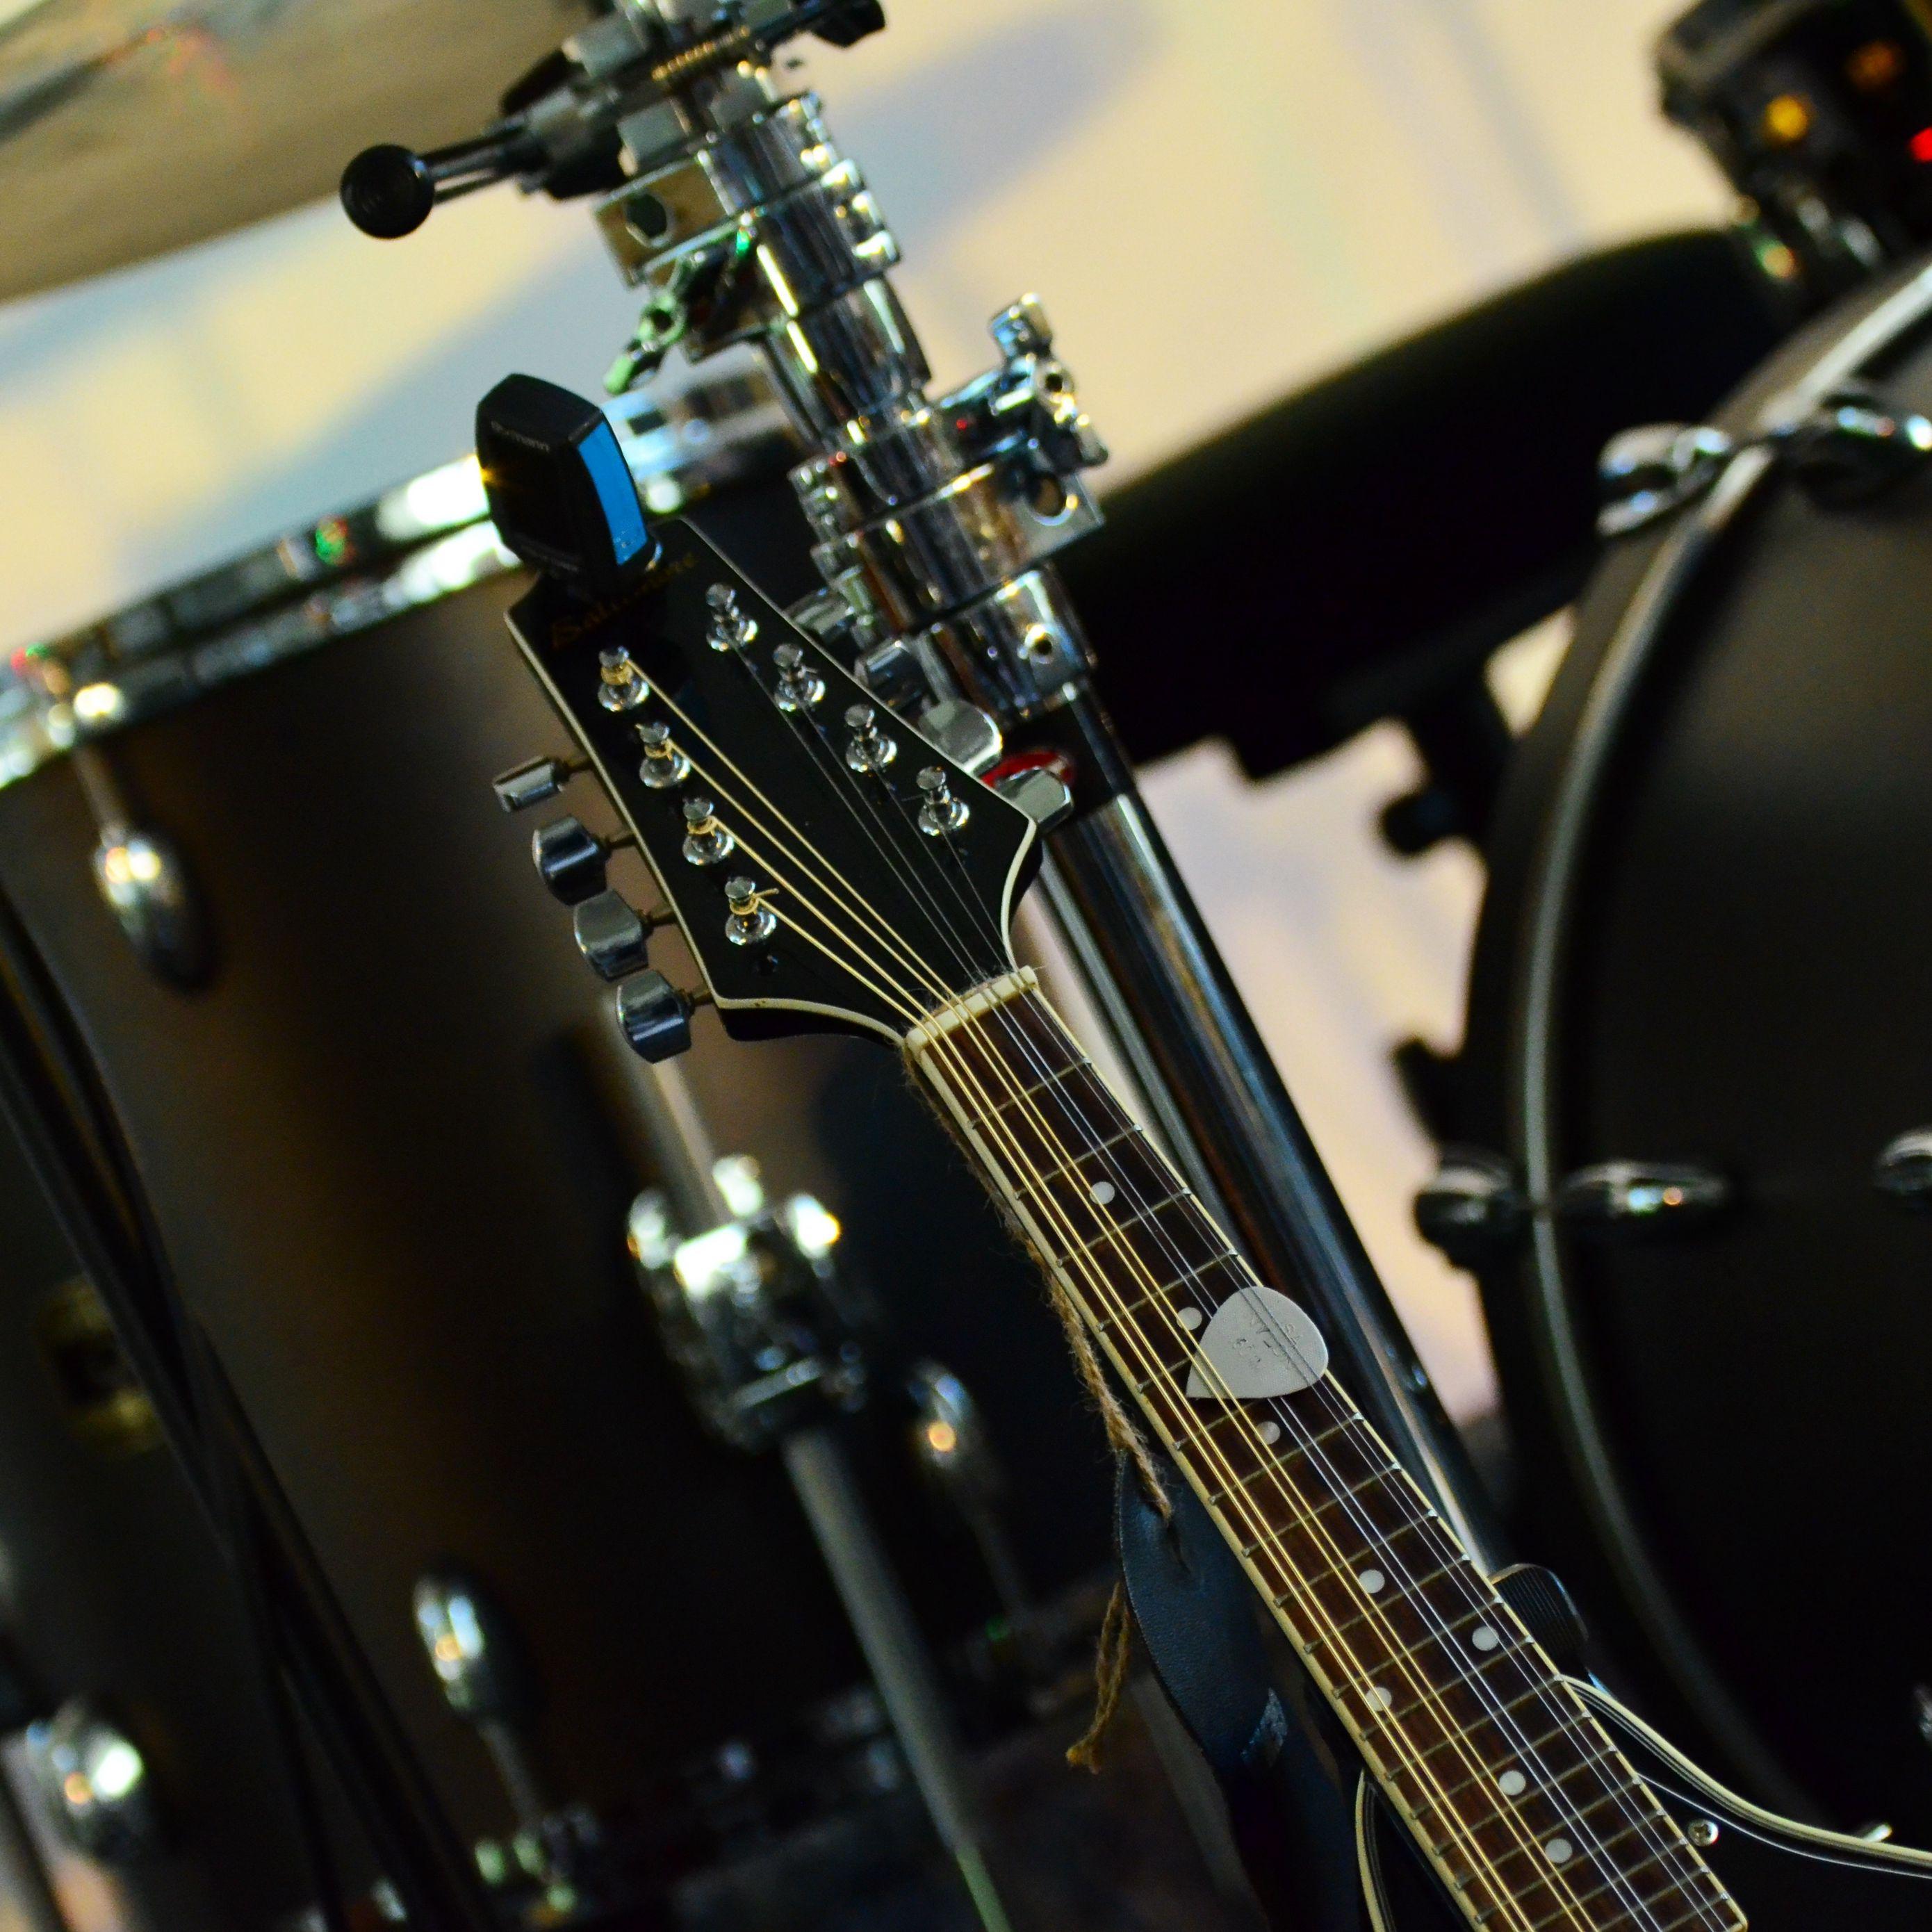 2780x2780 Wallpaper musical instrument, music, percussion, guitar